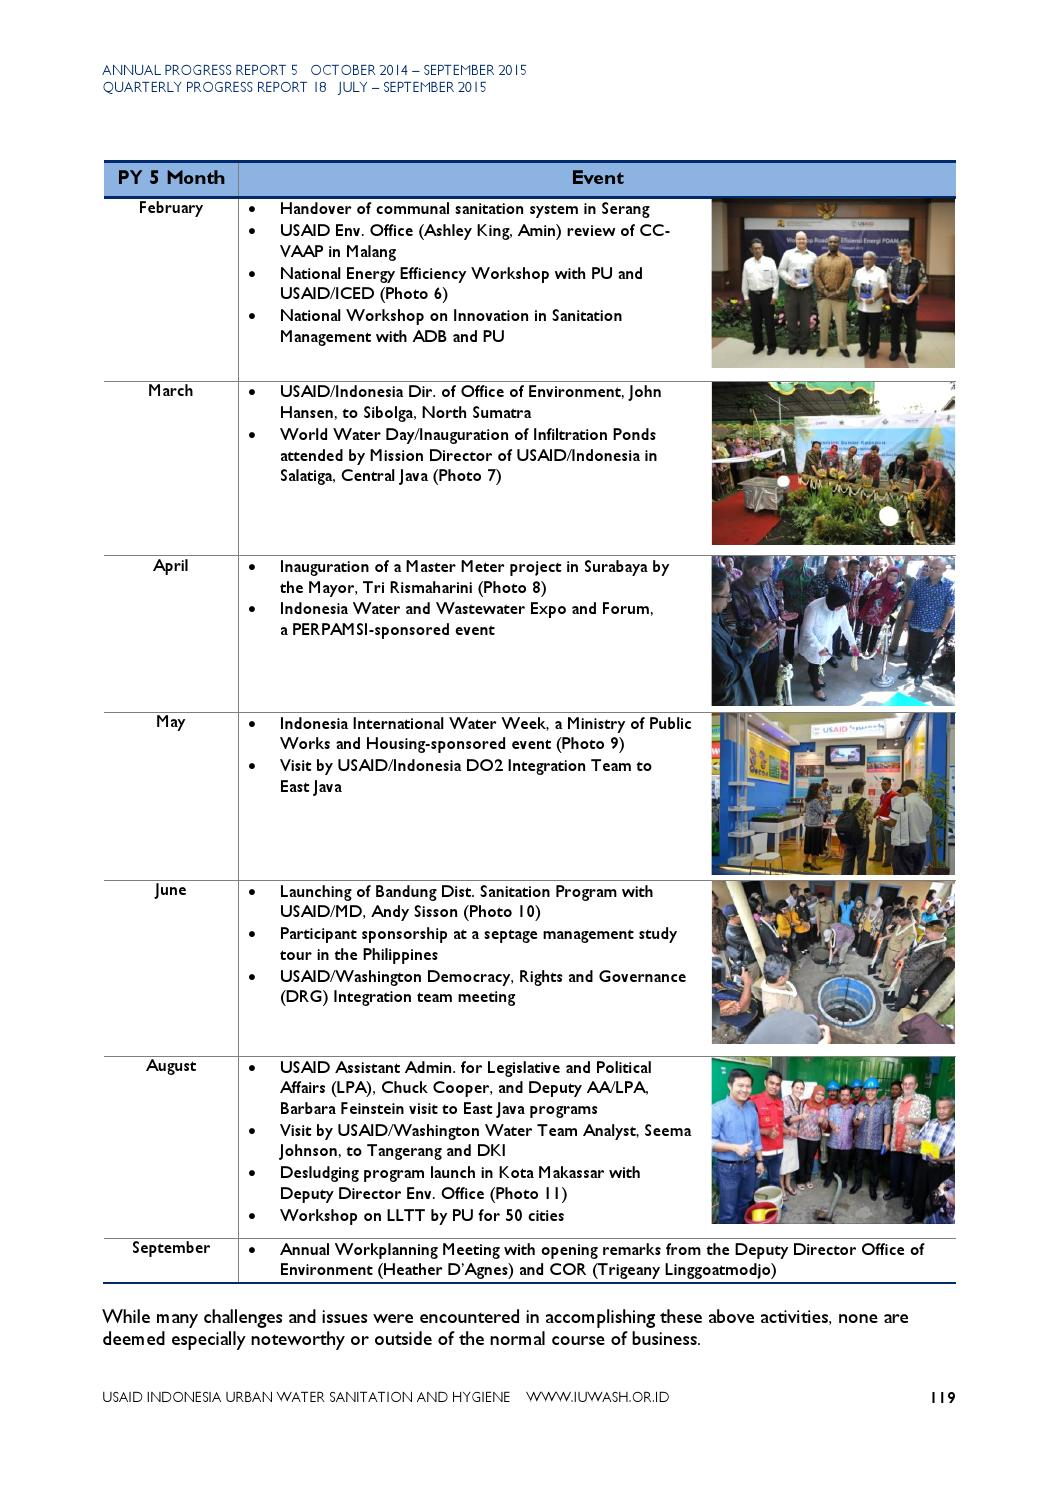 USAID IUWASH Annual Progress Report 5 (Oct 2014 - Sept 2015